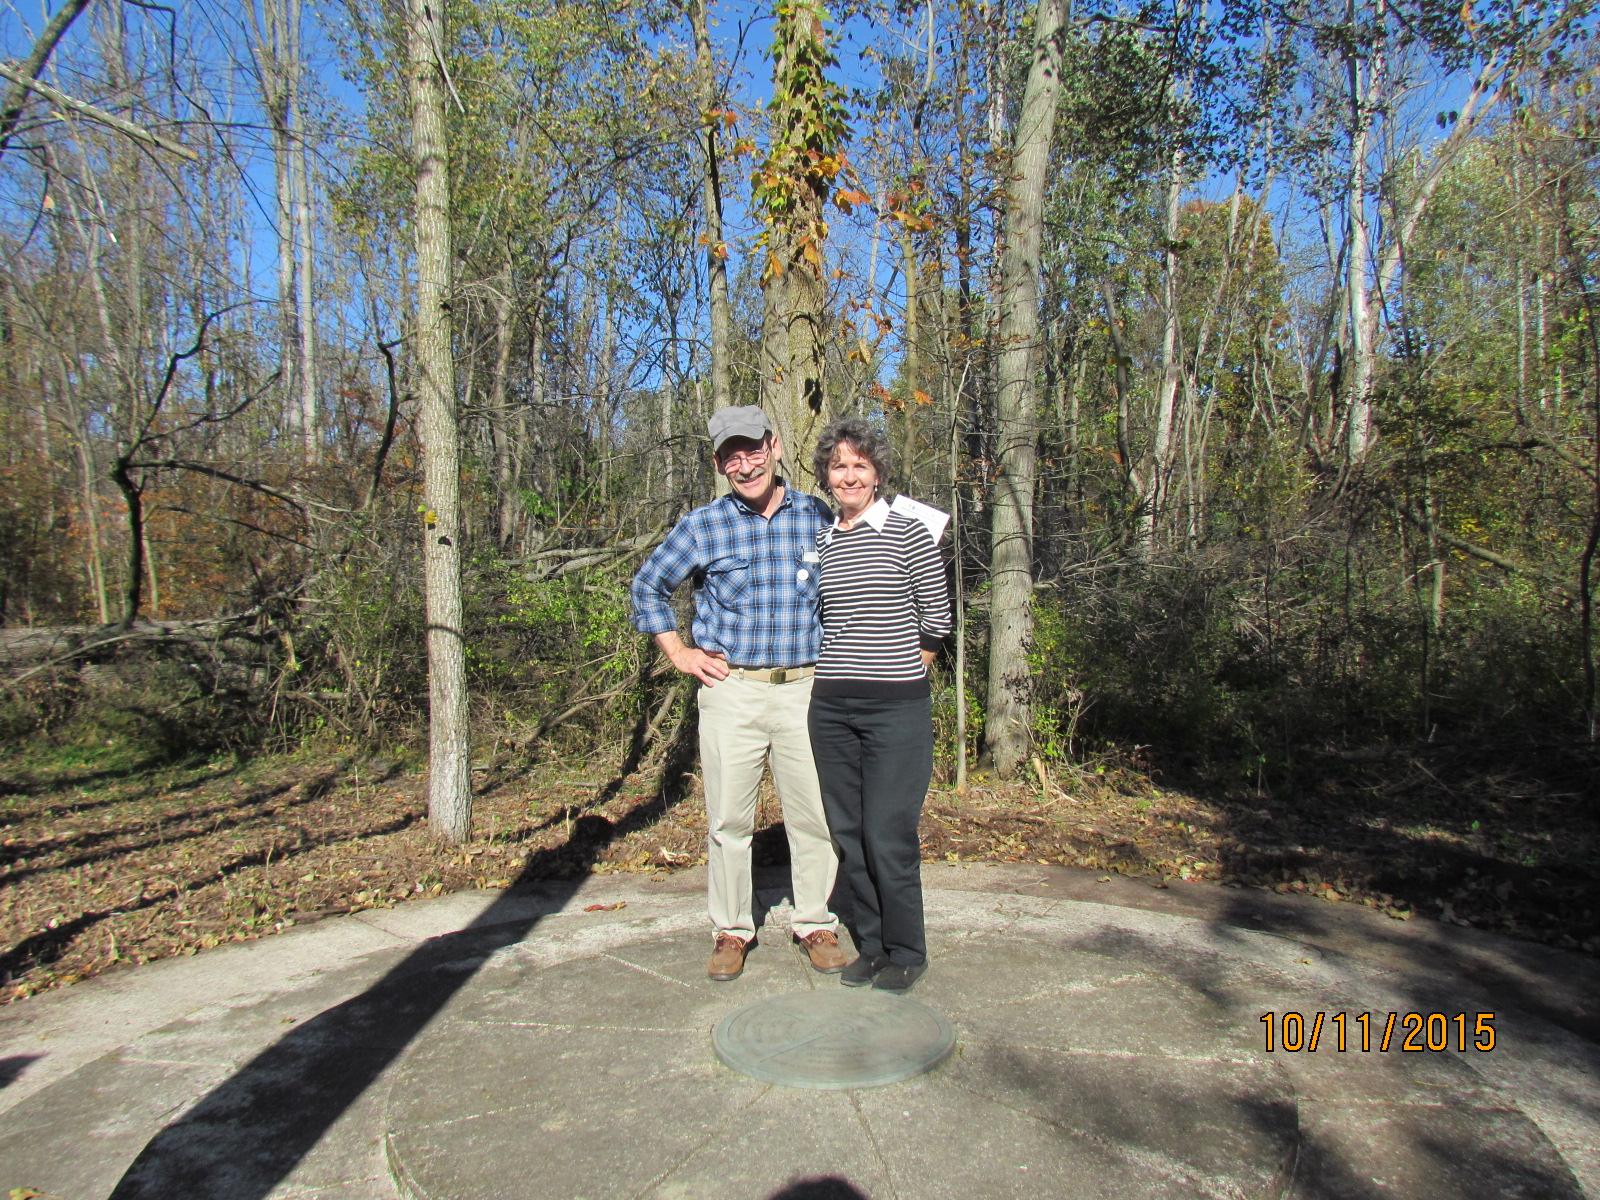 Community Event 2015: Surveying Michigan 200 Anniversary